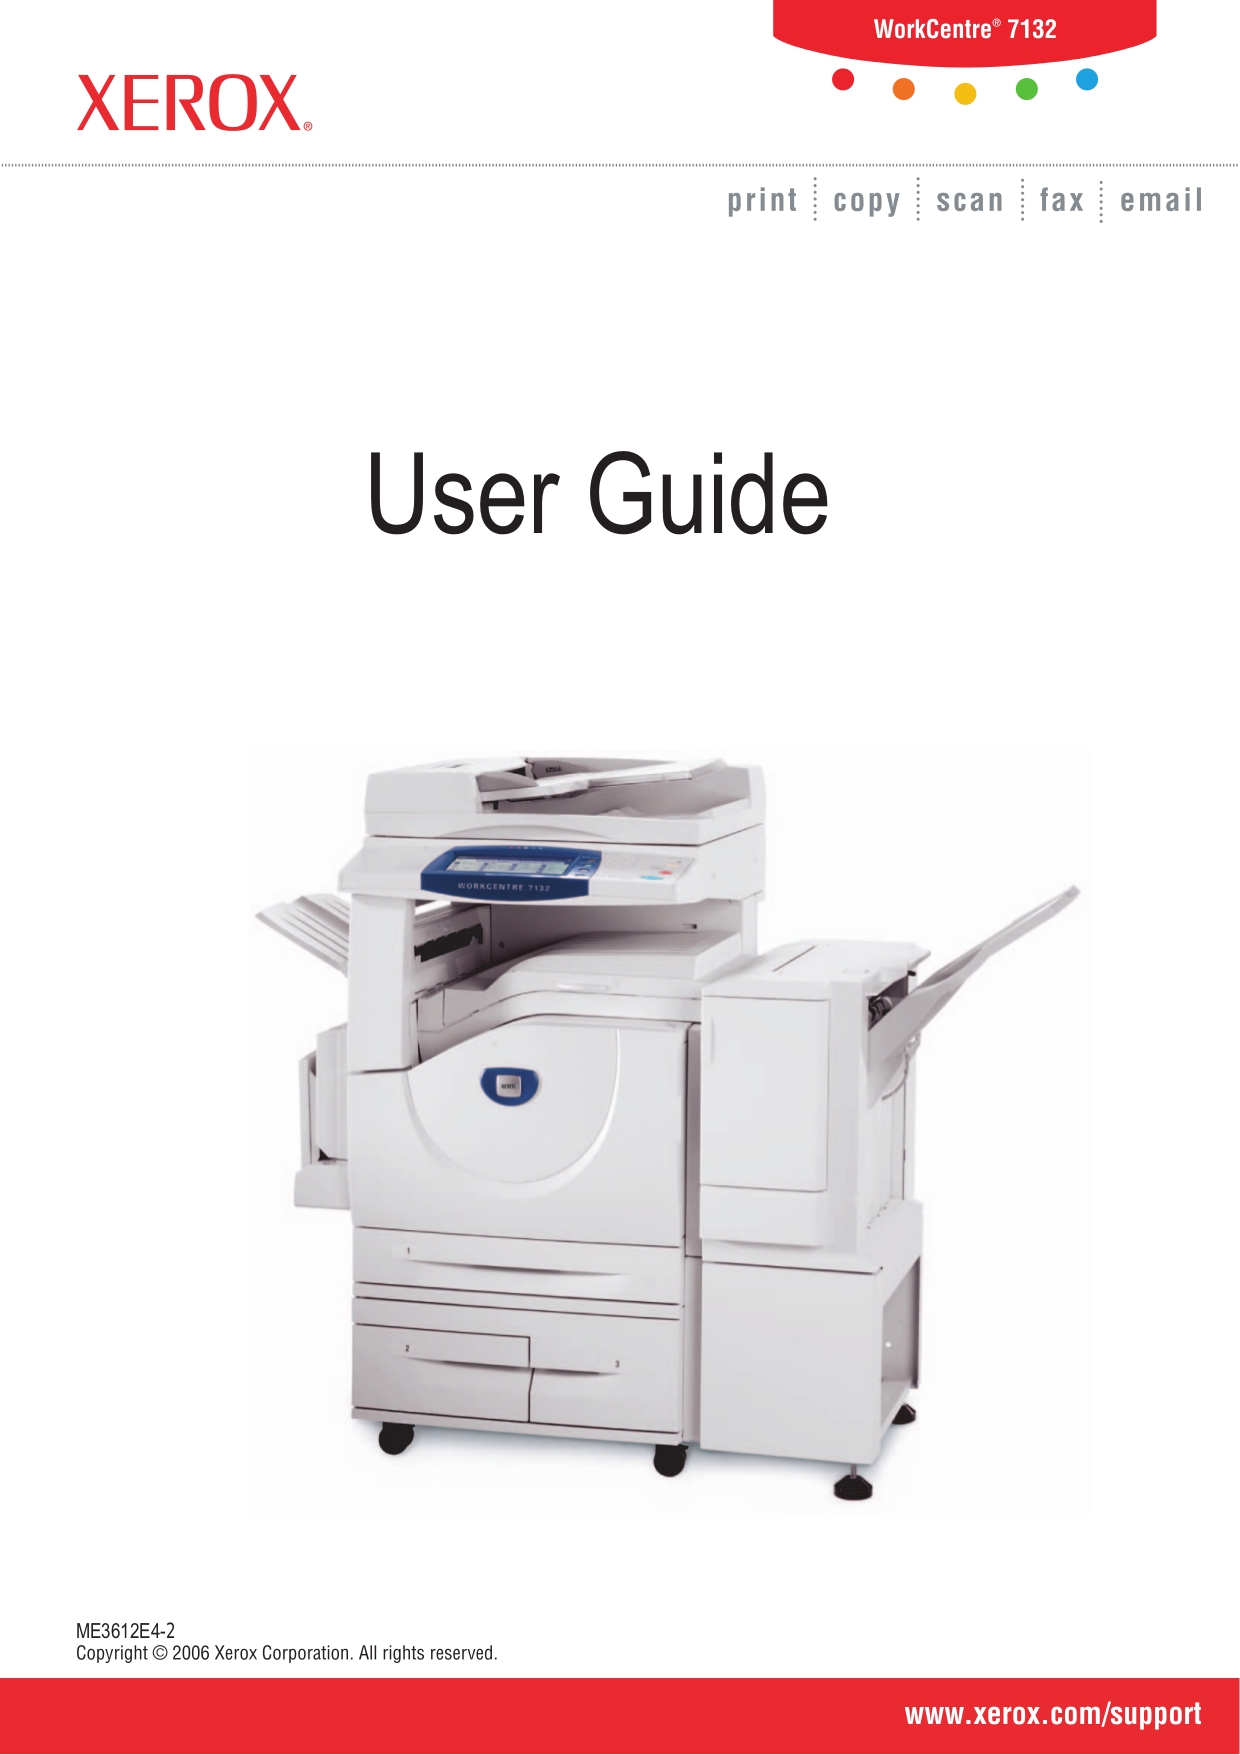 Xerox Phaser 6110 Mfp Service Manual Repair Guide ...